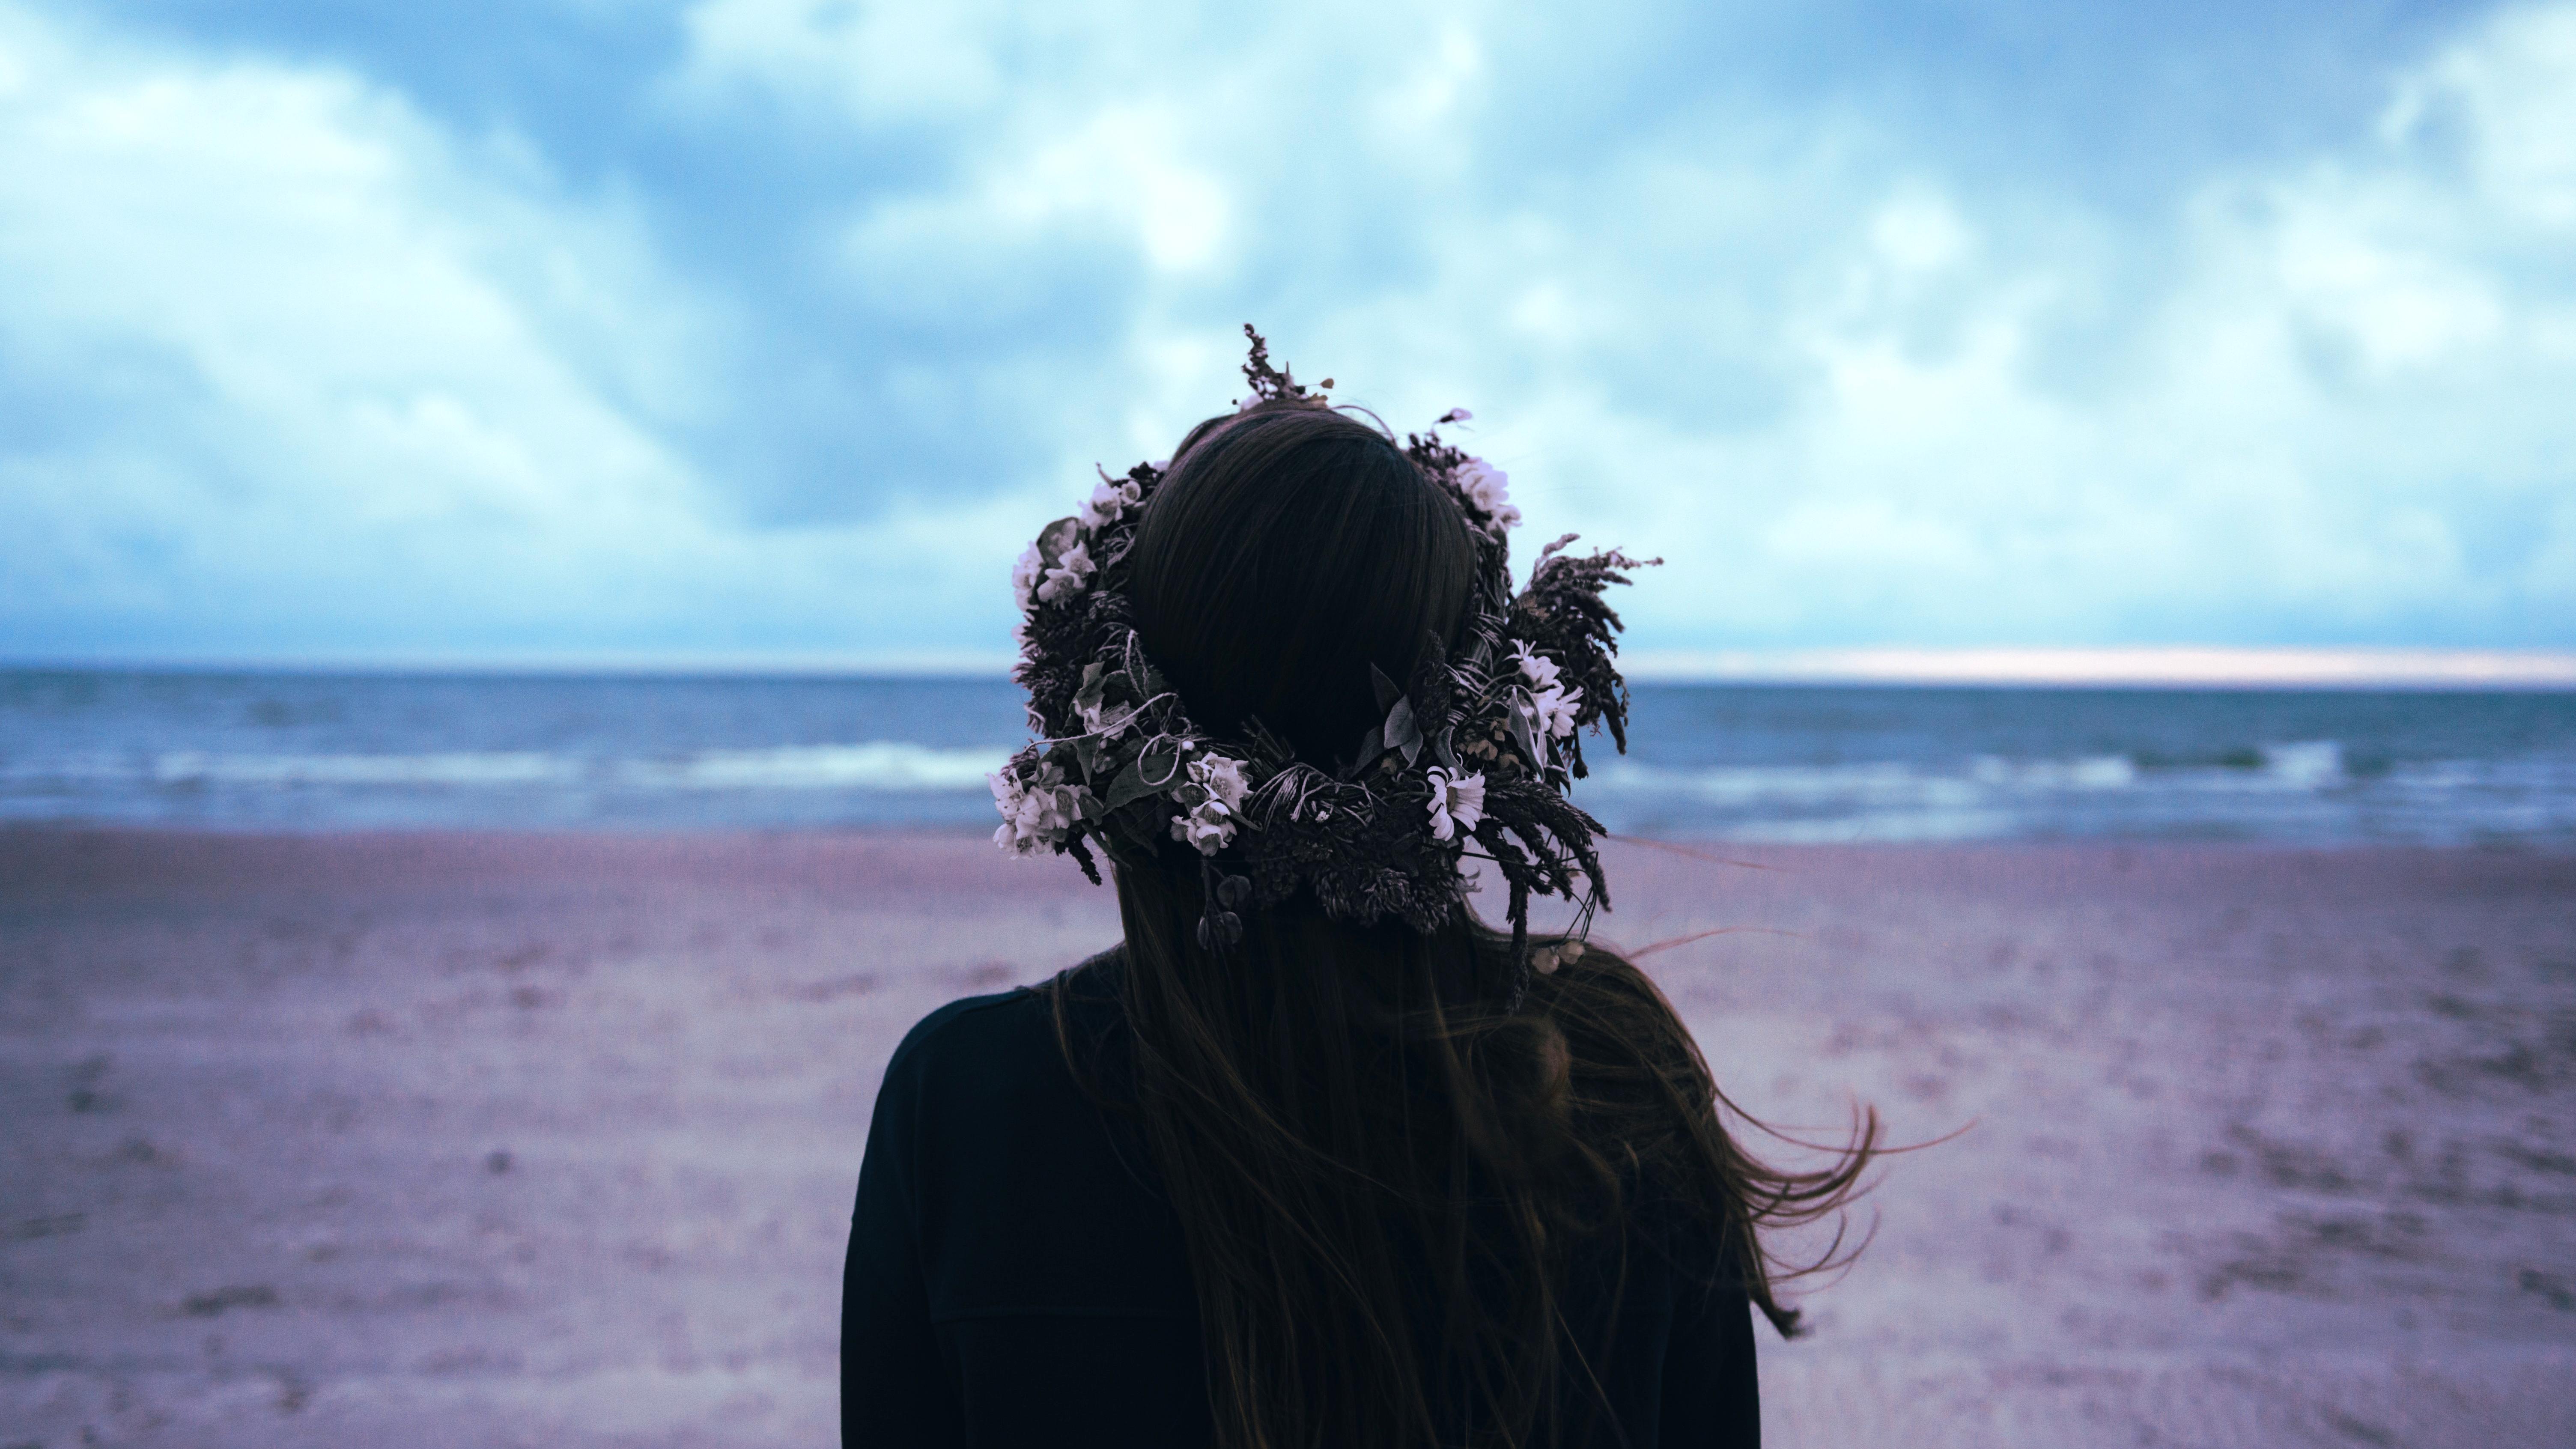 flower crown on head 1575664732 - Flower Crown On Head -